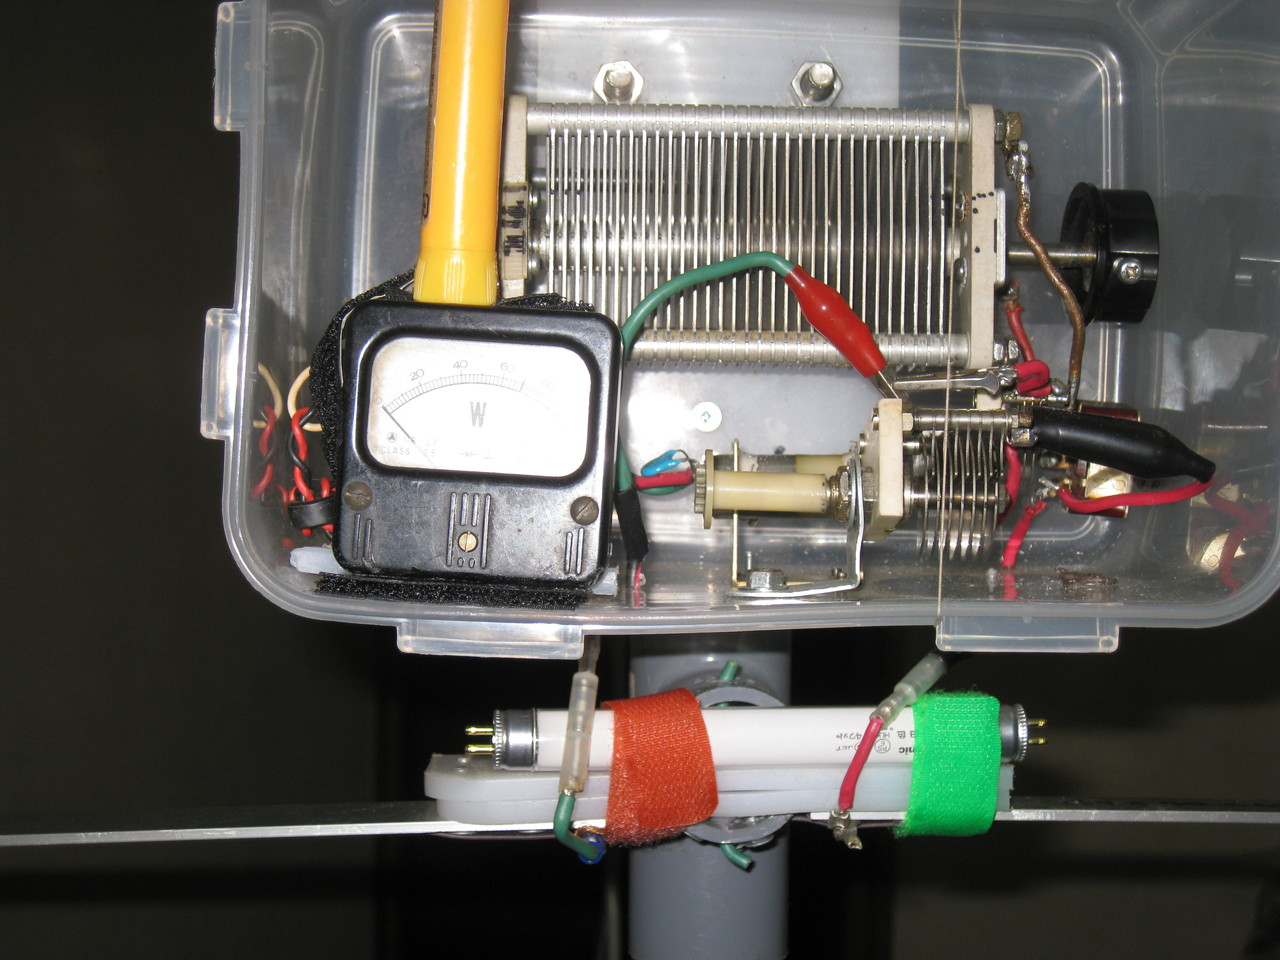 「400cm(内側L260cm)磁界型スモール・ループMLAアンテナ」同調部側に「監視・危害防止」用に100V4W蛍光管取り付けた状況拡大写真